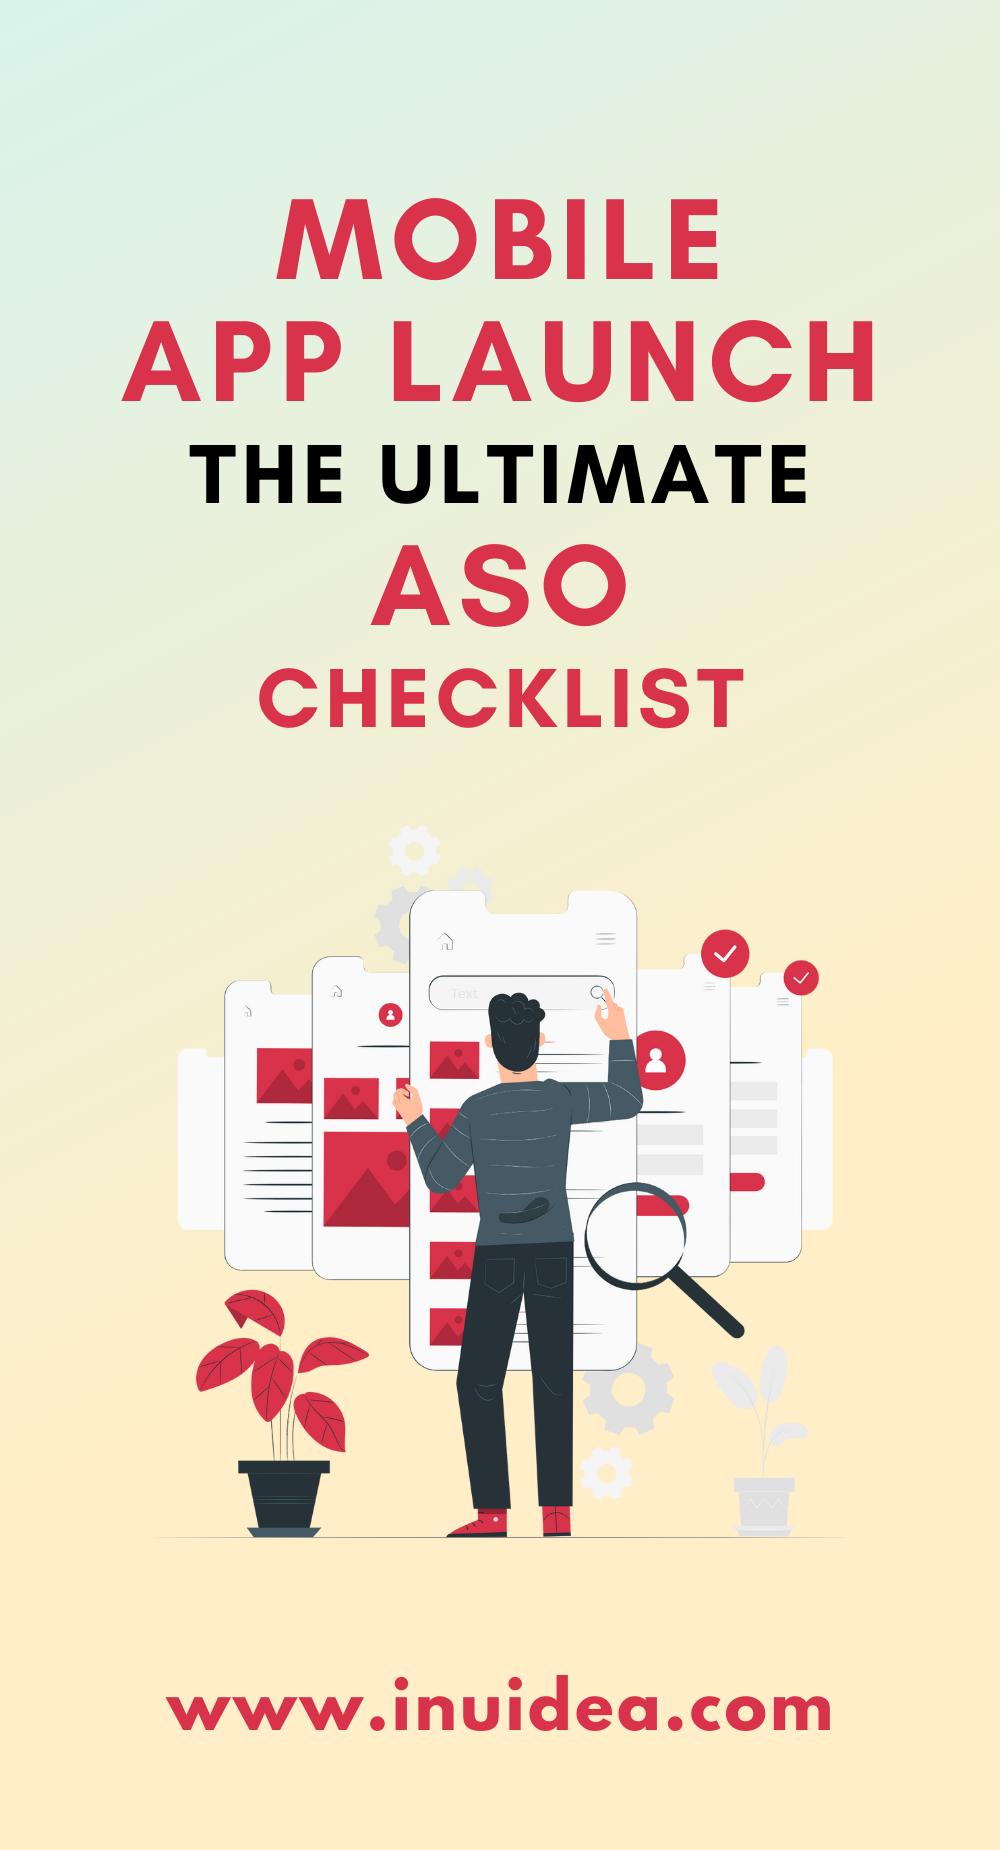 Mobile App Launch - The Ultimate ASO Checklist